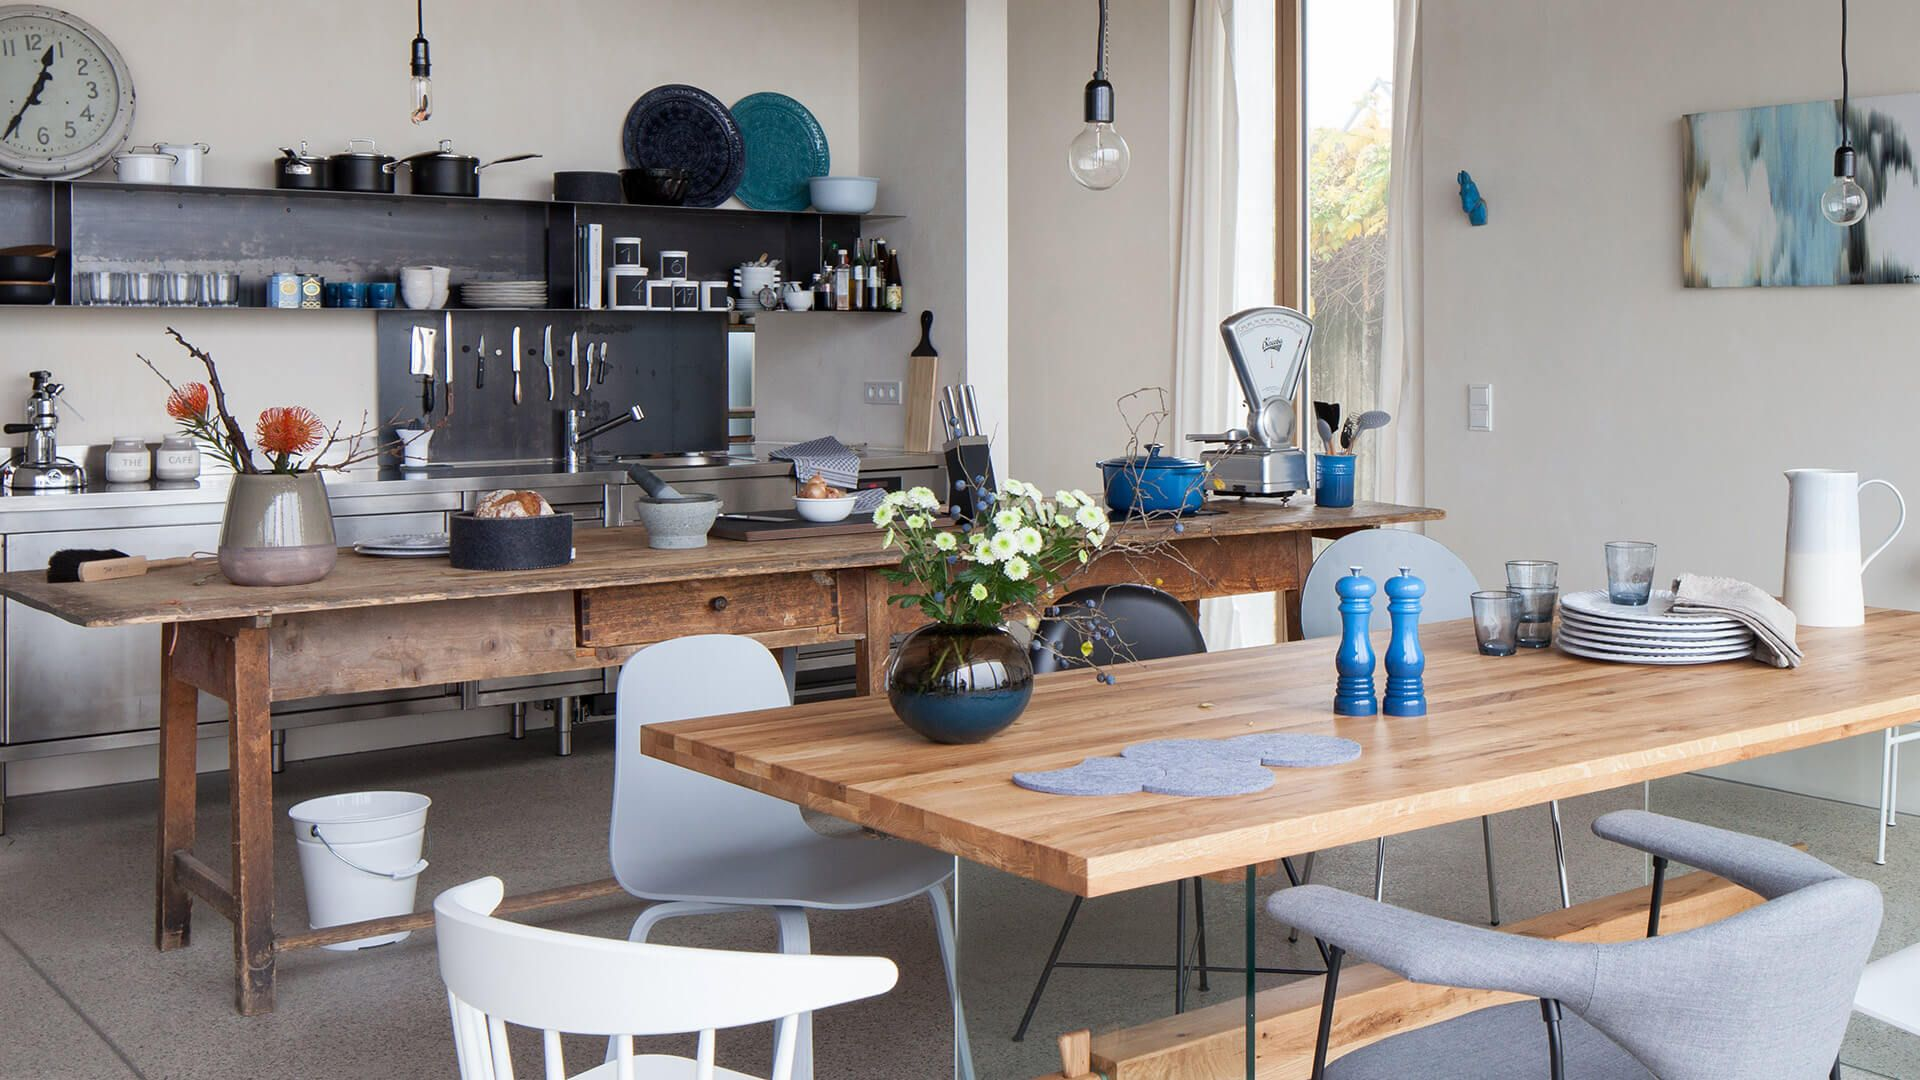 Werkbankartiger Tisch statt Kücheninsel | Rooms | Pinterest ...